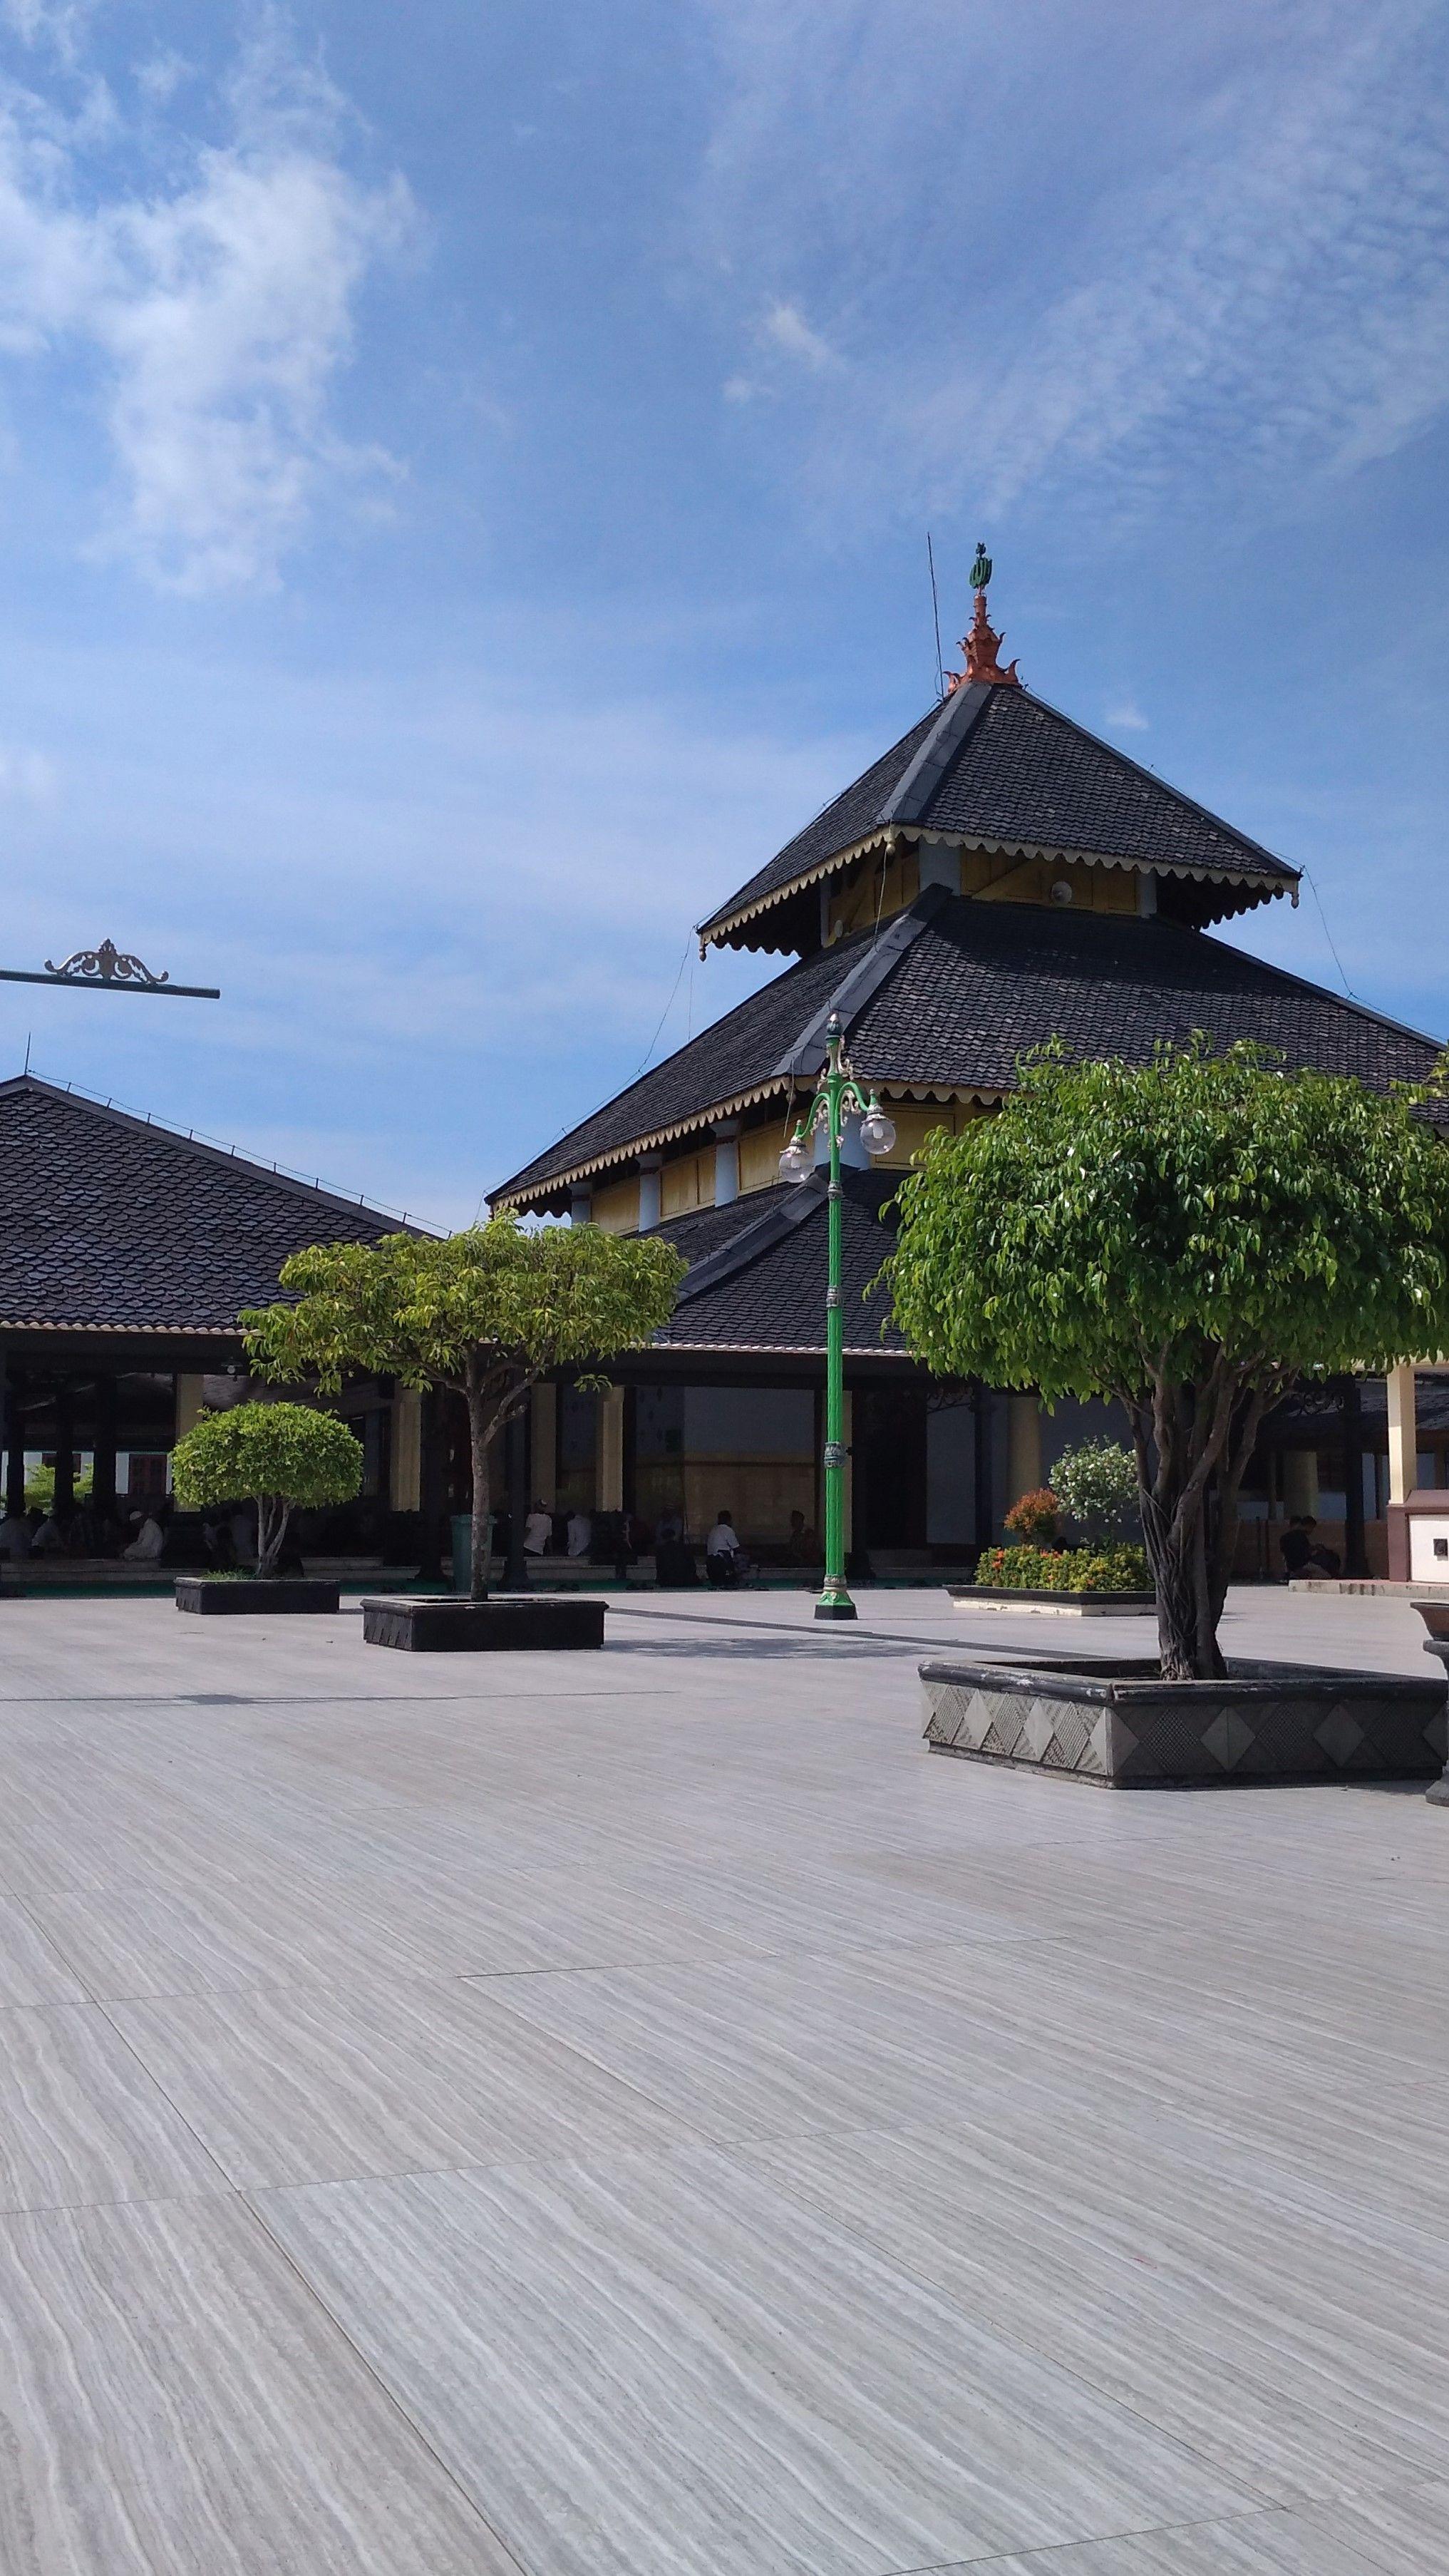 Masjid Agung Demak. sumber: id.pinterest.com/Muezza